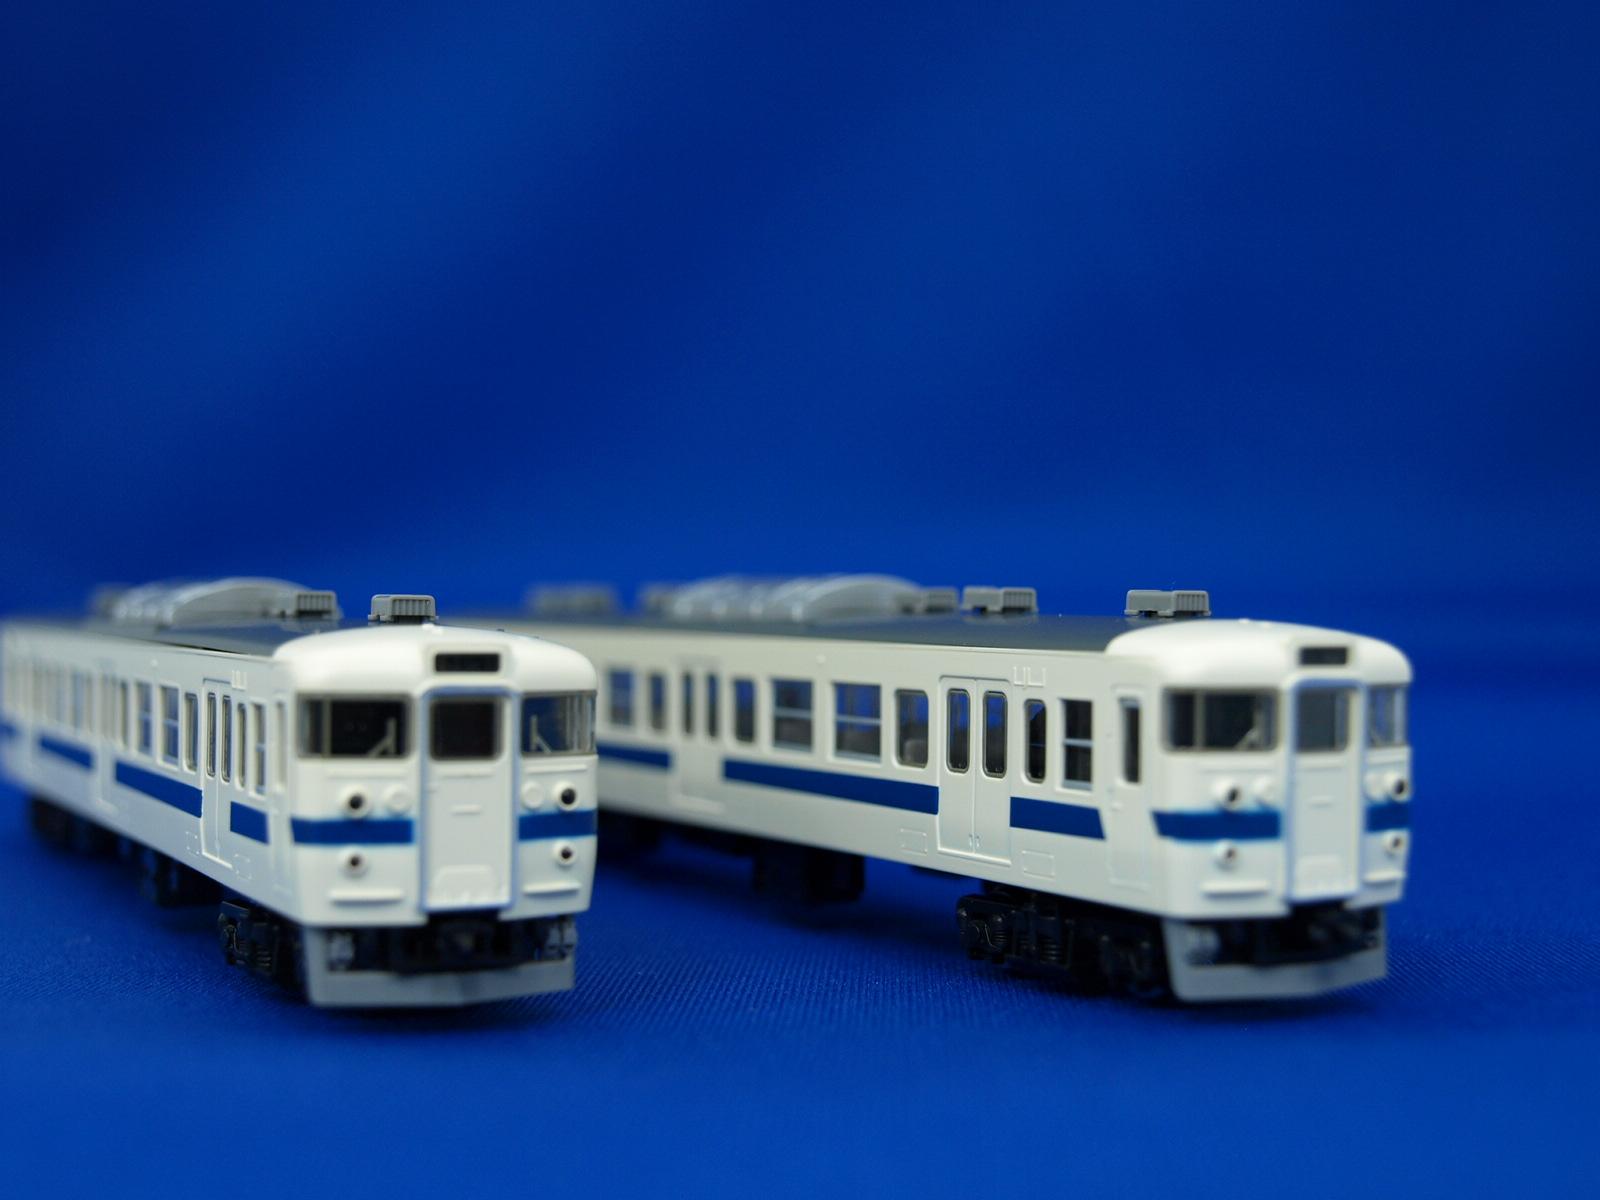 Nゲージ トミックス 92884 国鉄 415系近郊電車(常磐線)基本7両セットA